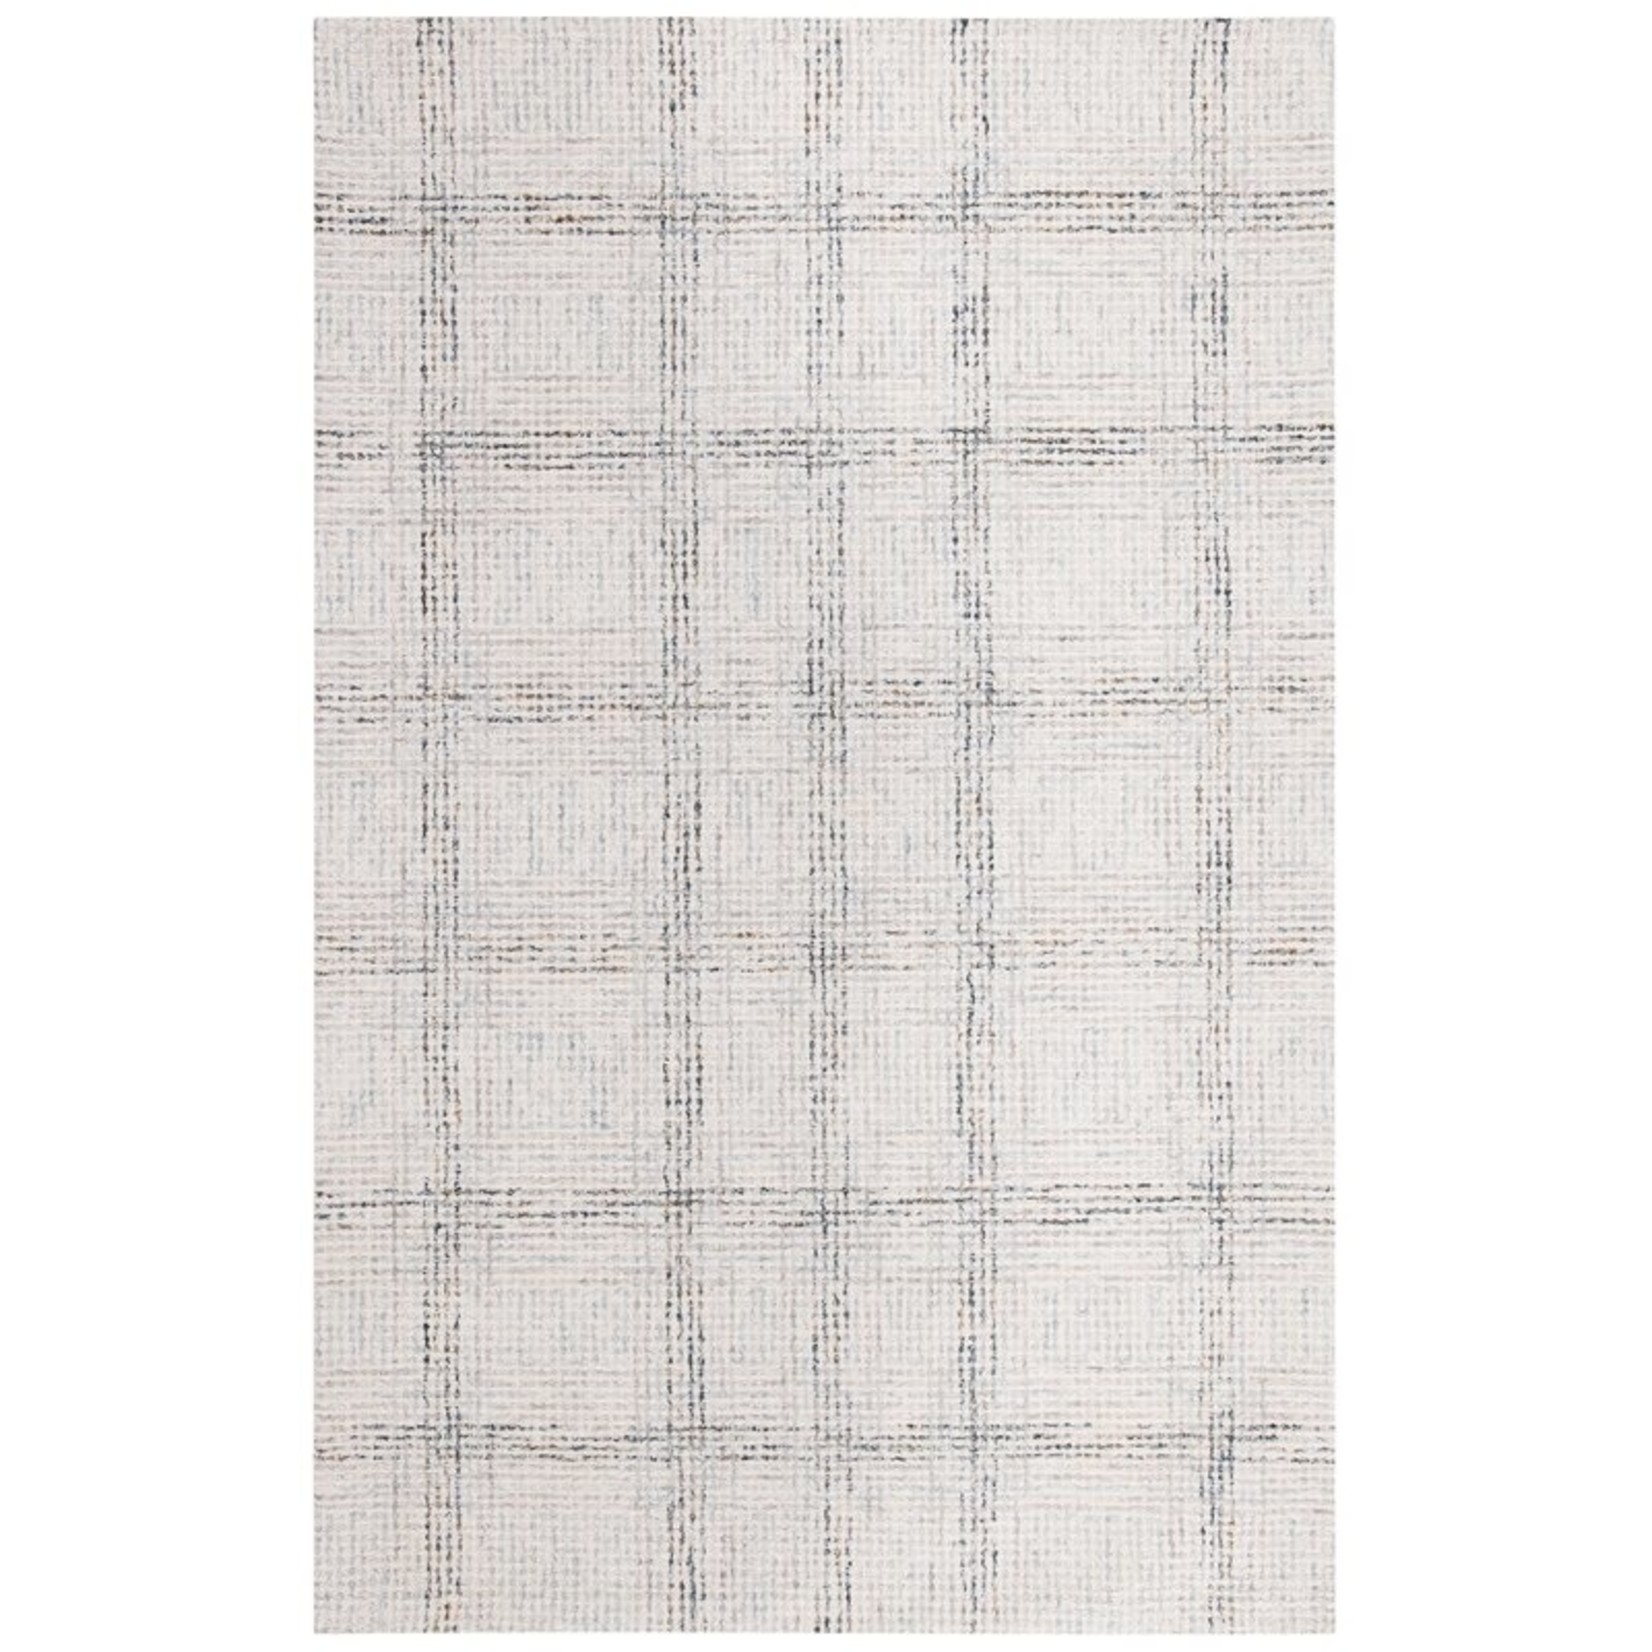 *4' x 6' - Tati Plaid Handmade Tufted Cotton/Wool Ivory/Gray Area Rug